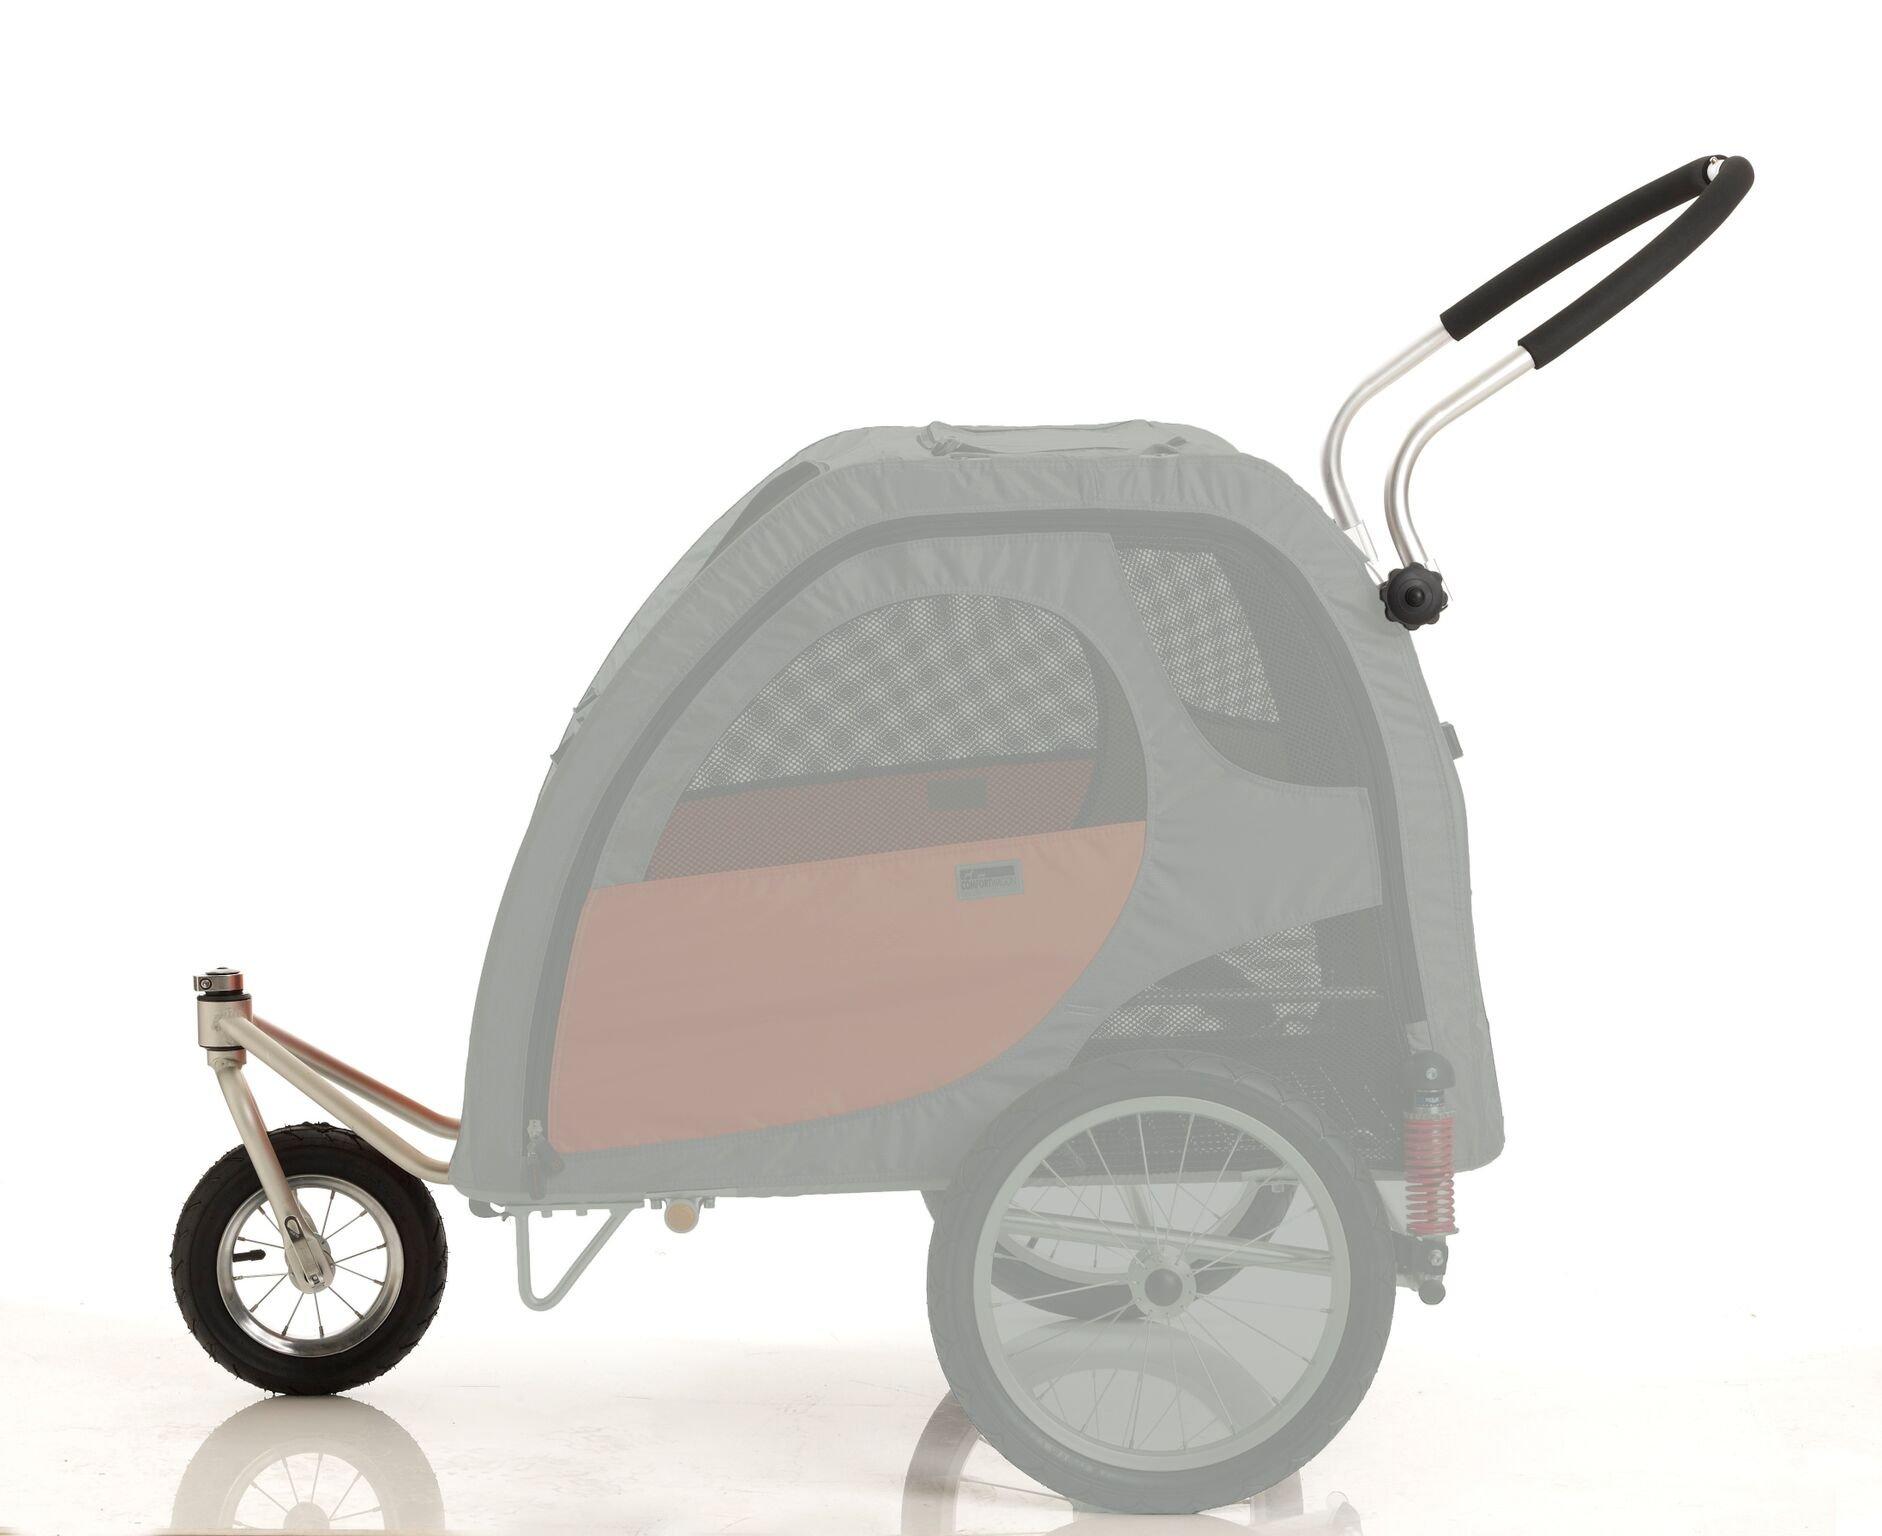 Petego Stroller Conversion Kit for Comfort Wagon Pet Bicycle Trailer, Large